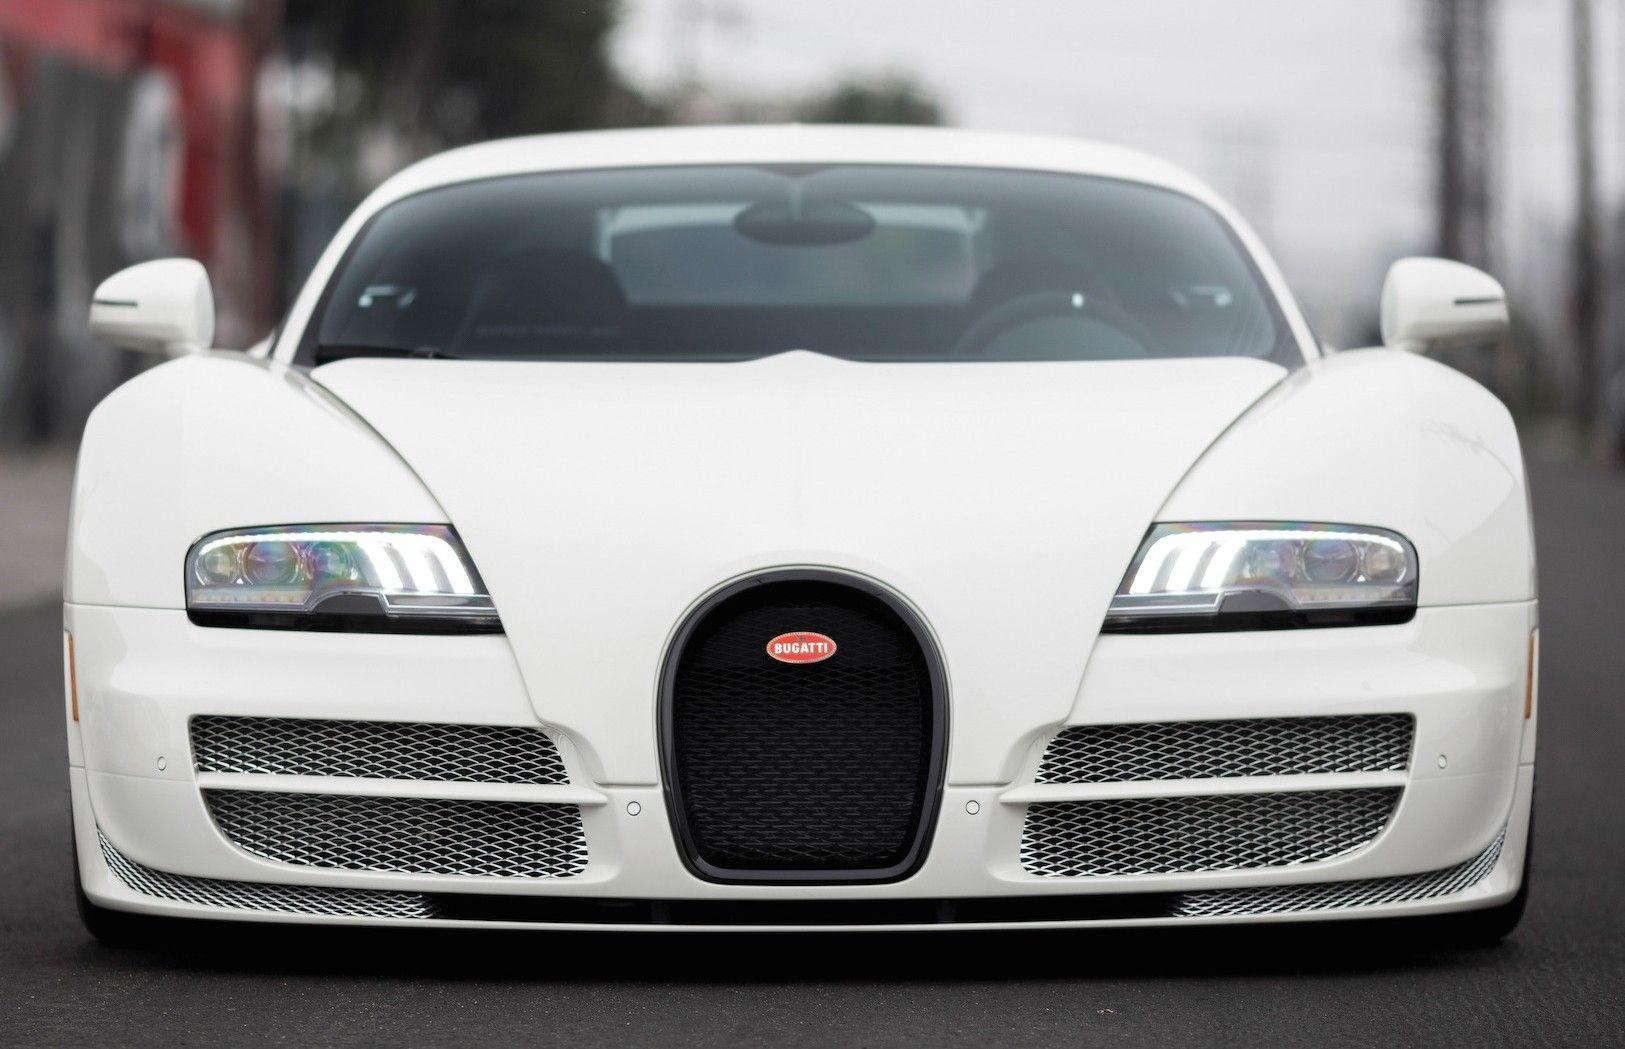 Bugatti Cars Price In India Bugatti Car Models 2021 Images Reviews